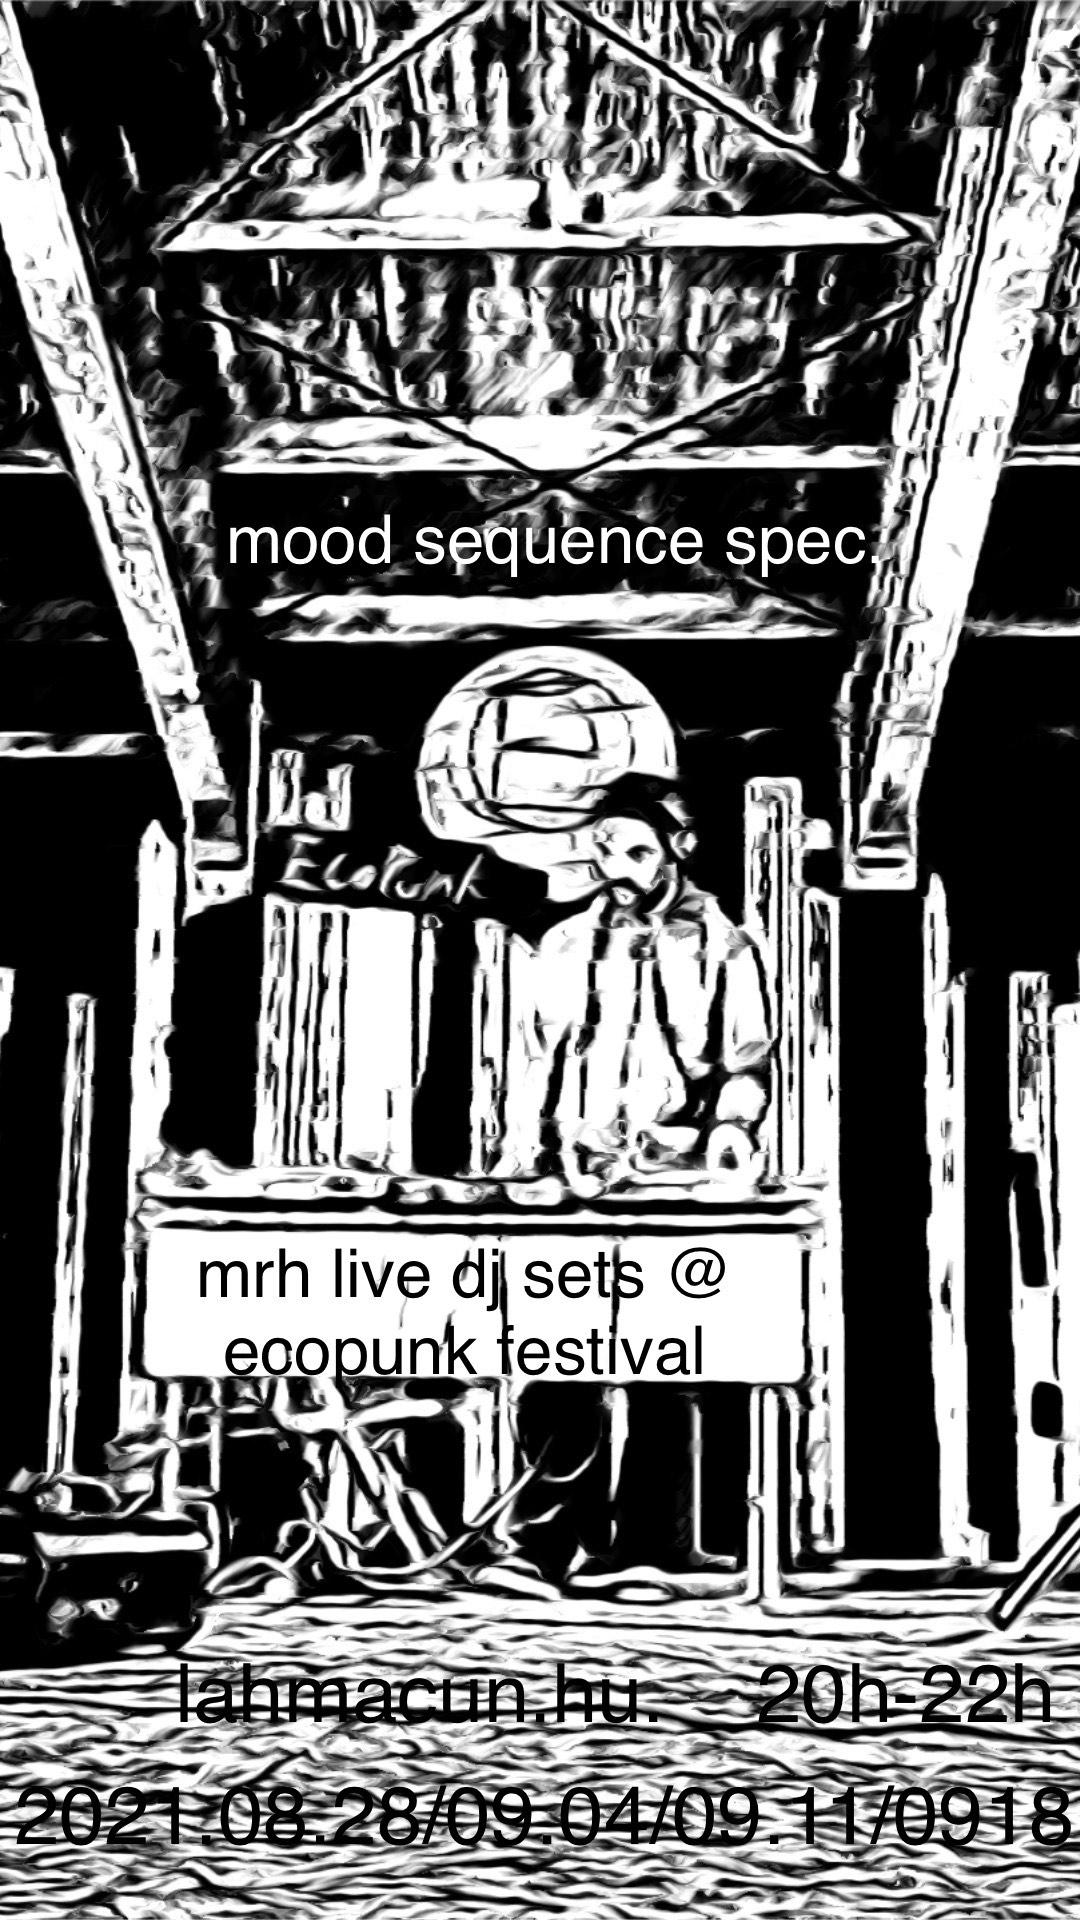 mrh live dj set@ecopunk festival part 1